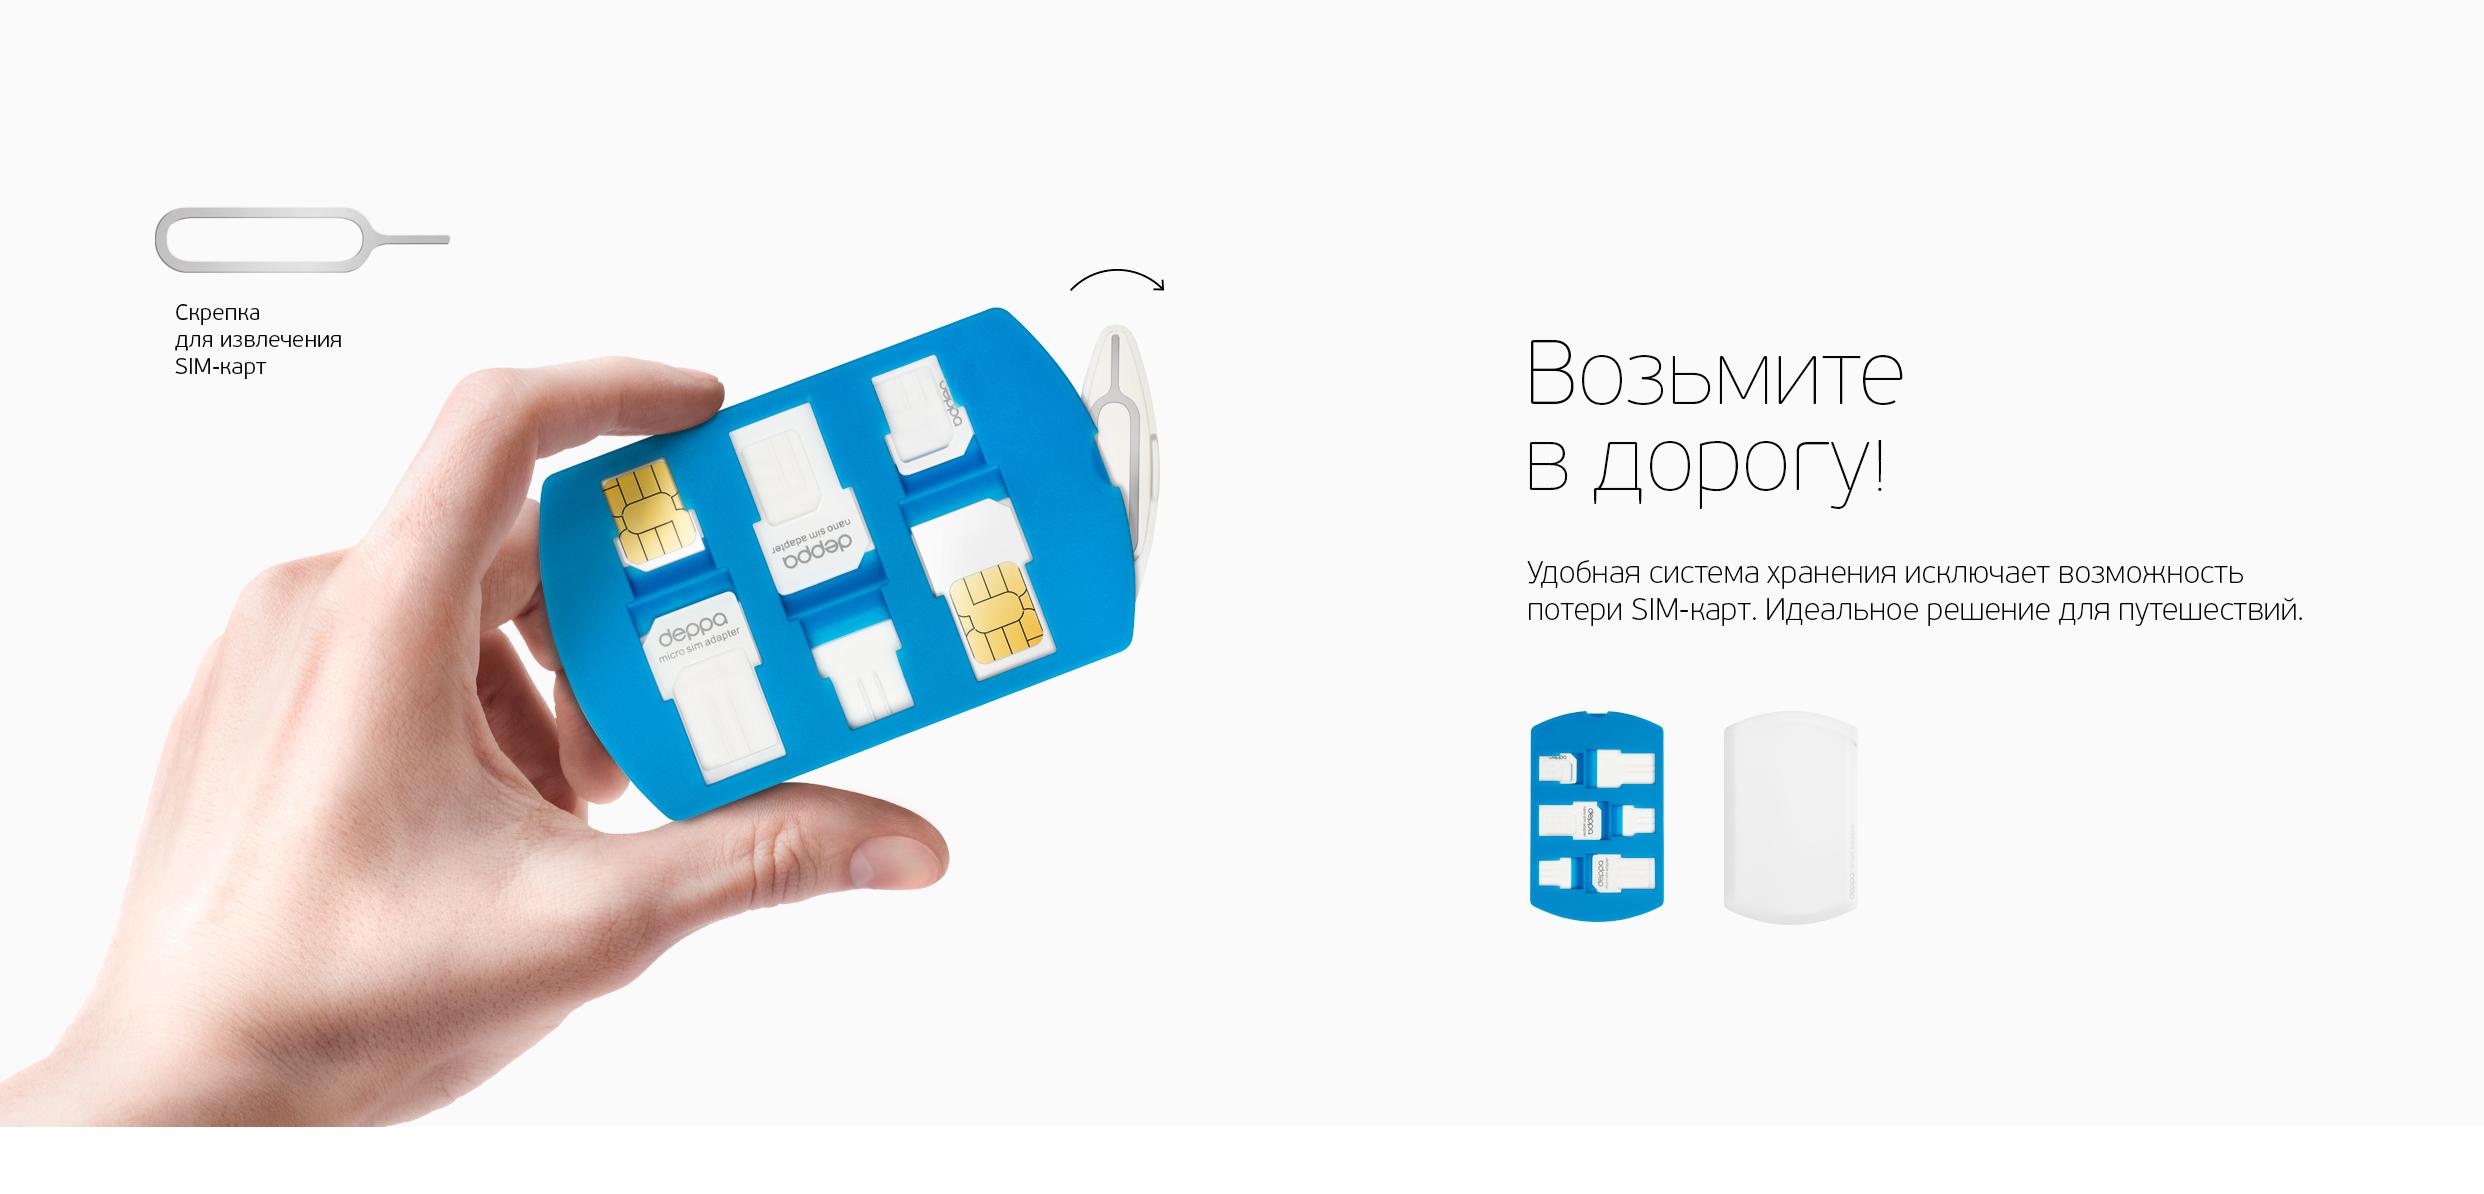 SIM card адаптеры и система хранения